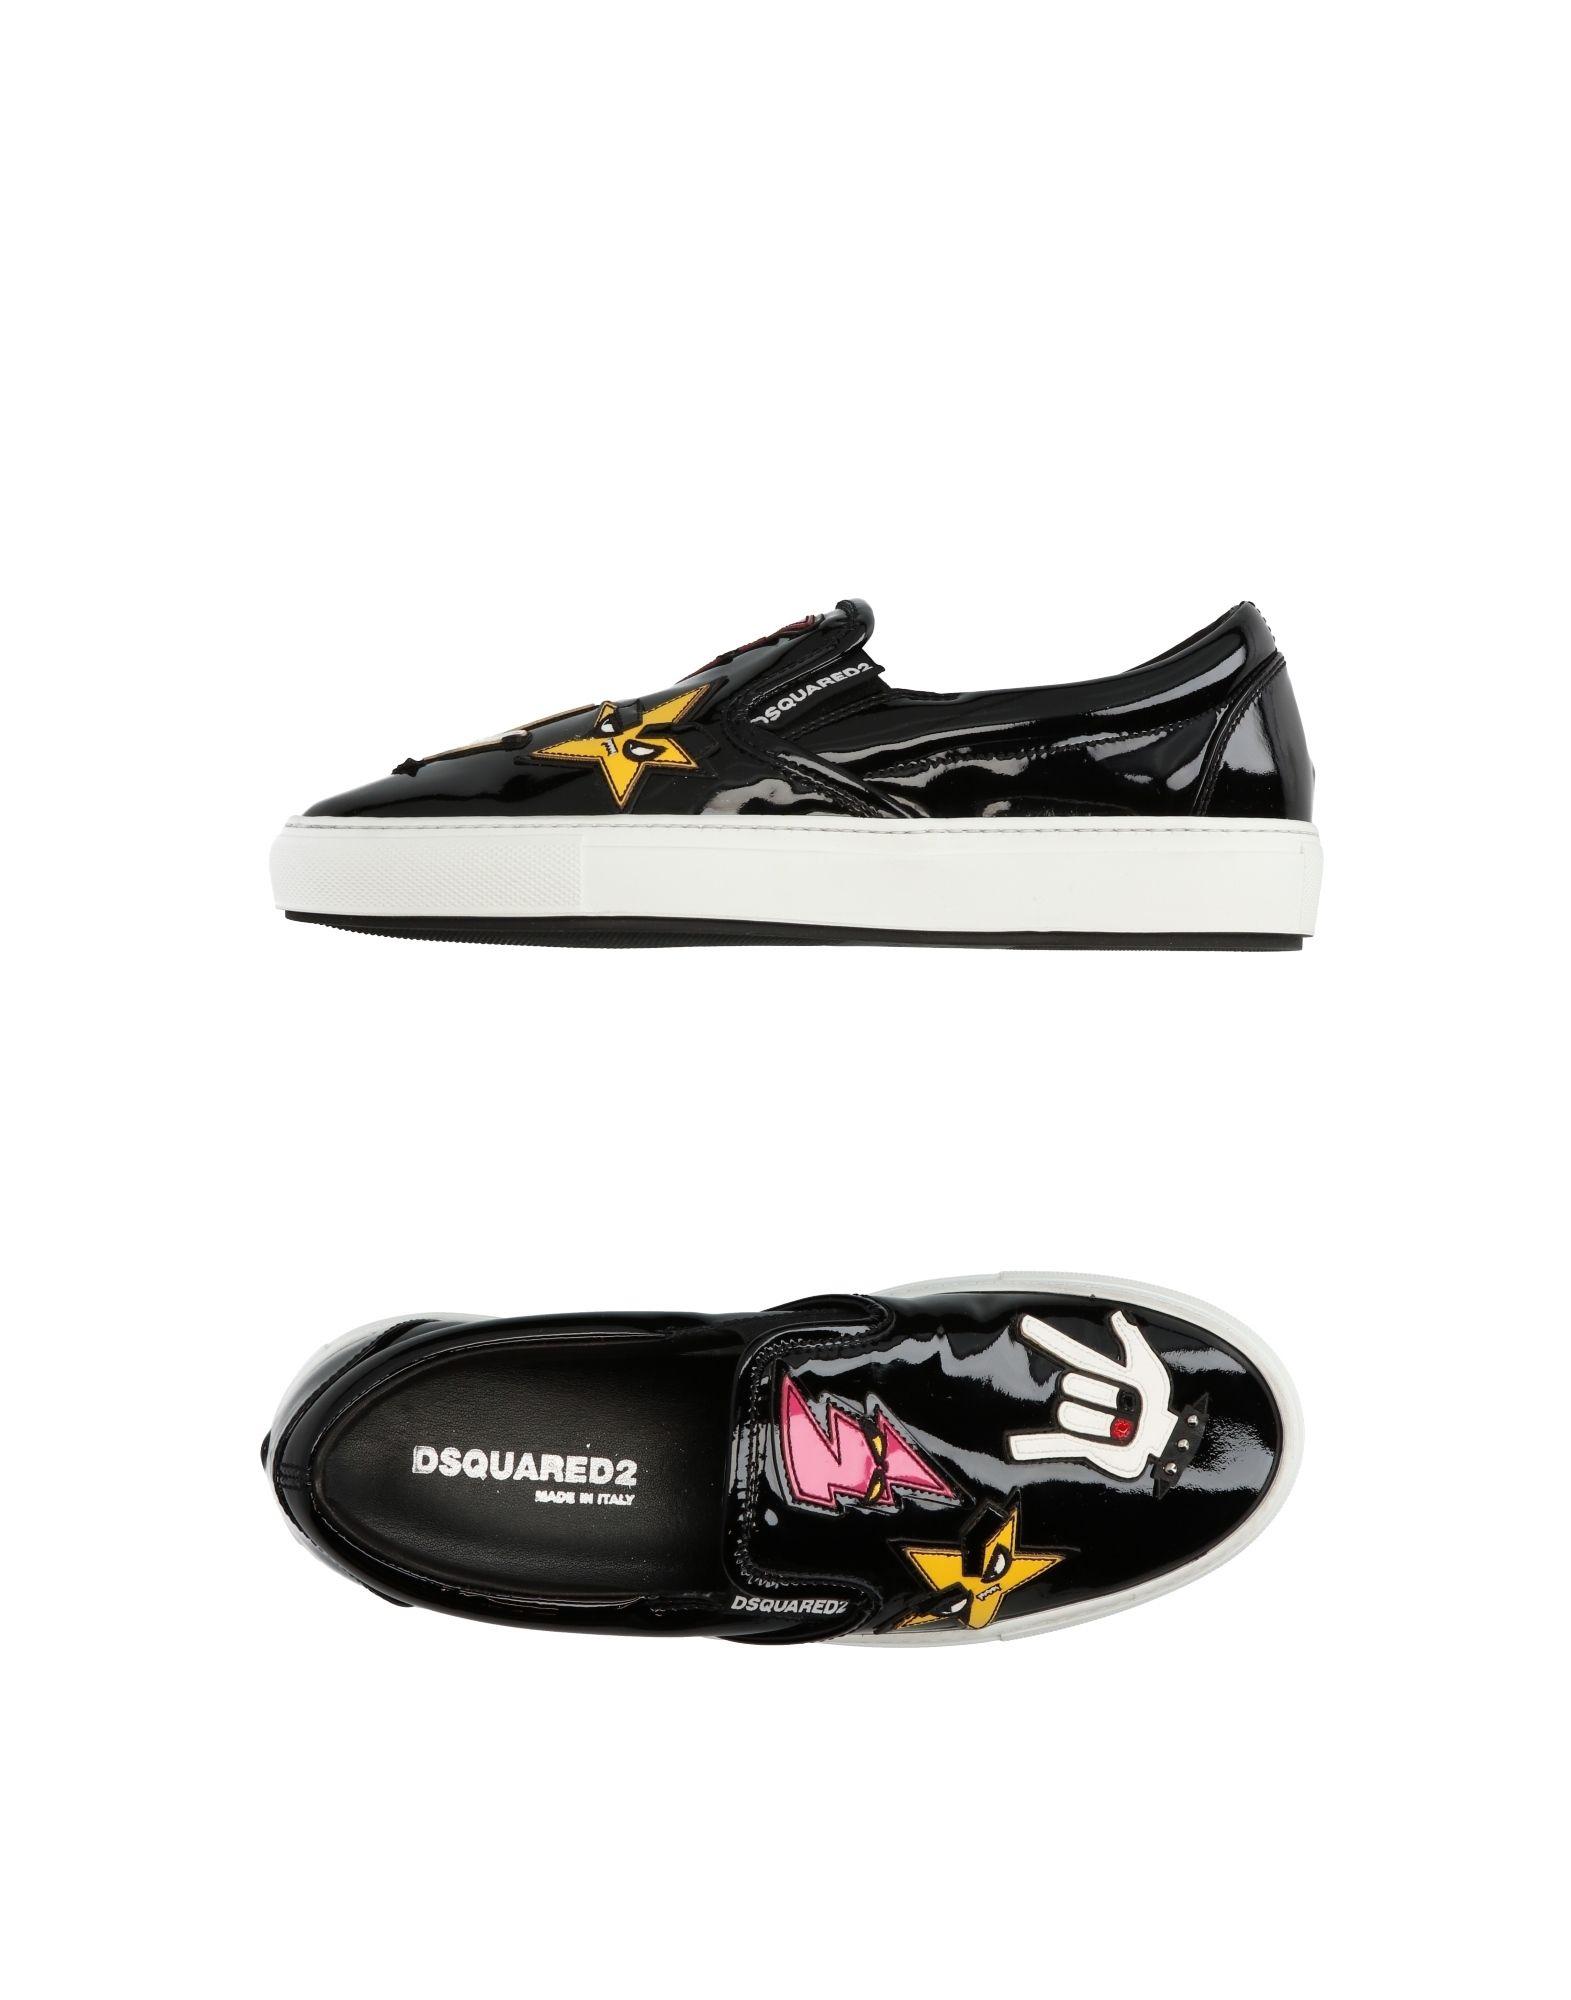 Dsquared2 Sneakers Herren  11298713PA Gute Qualität beliebte Schuhe